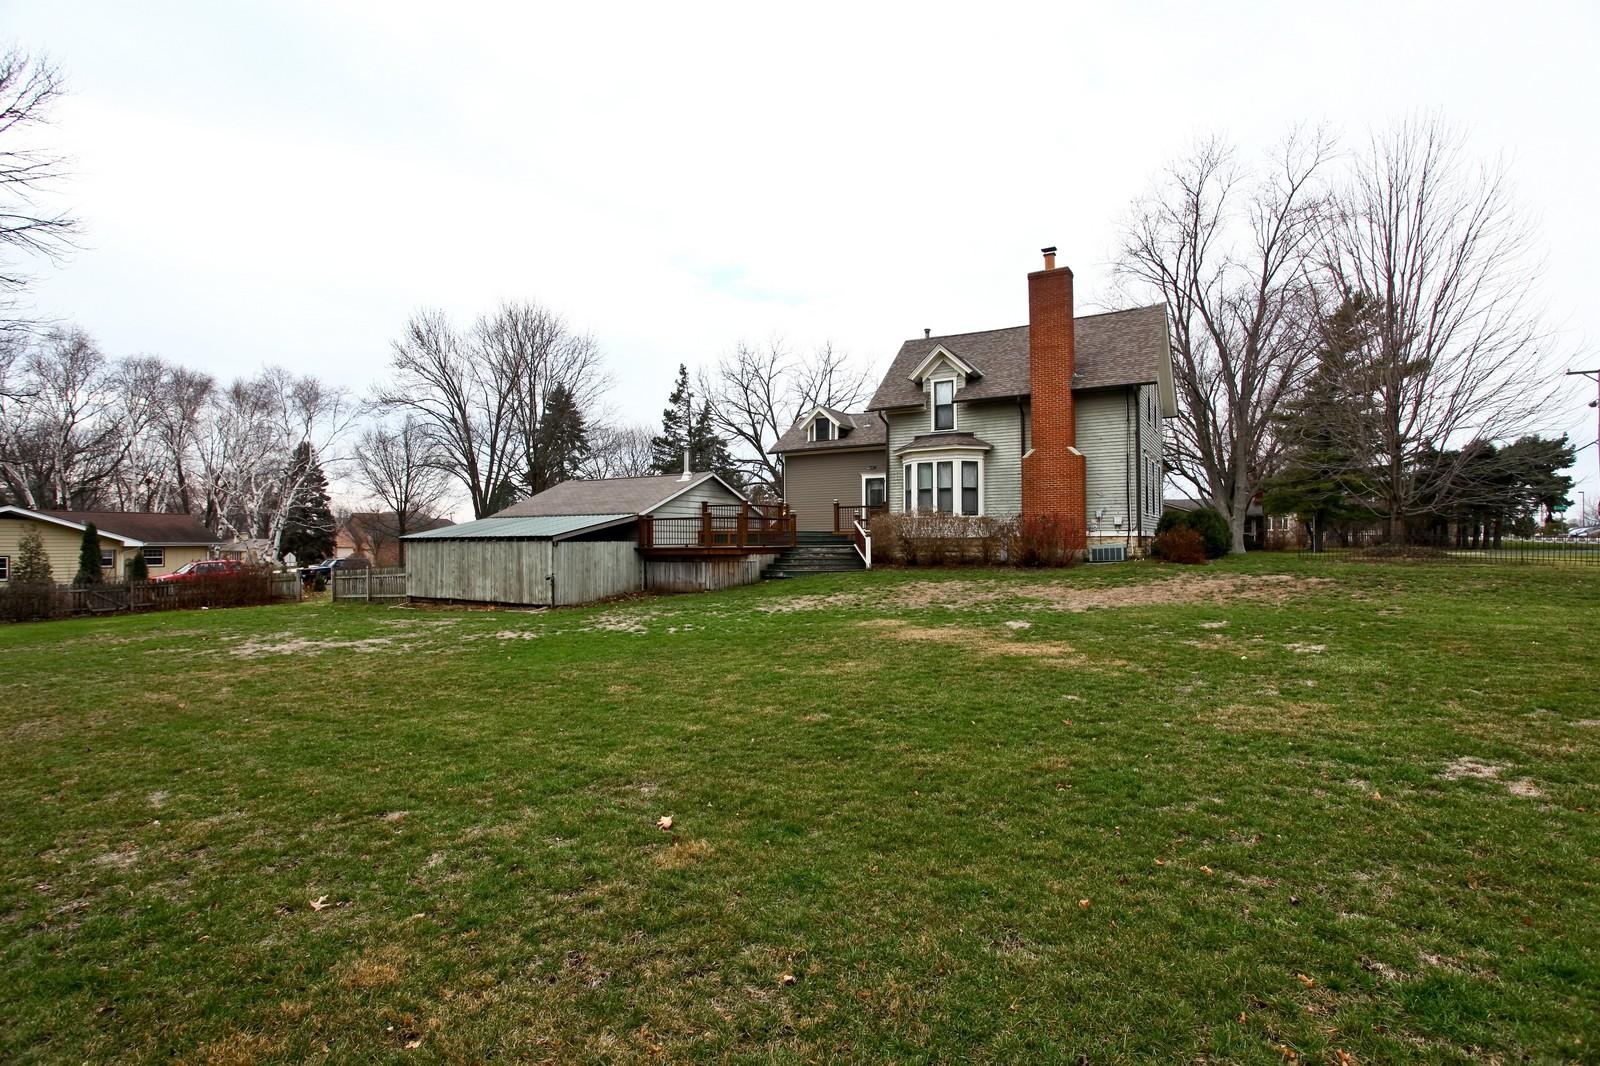 Real Estate Photography - 1126 Main St, Batavia, IL, 60510 - Rear View